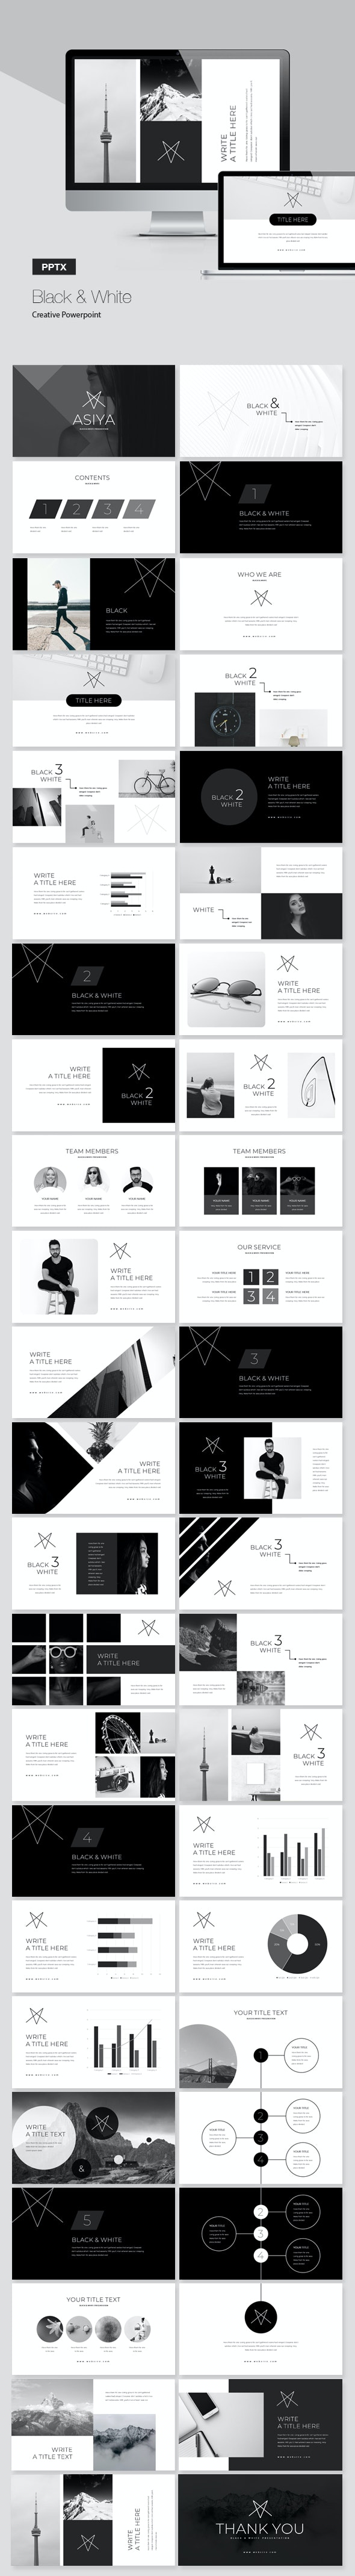 Black & White Powerpoint Presentation - Creative PowerPoint Templates